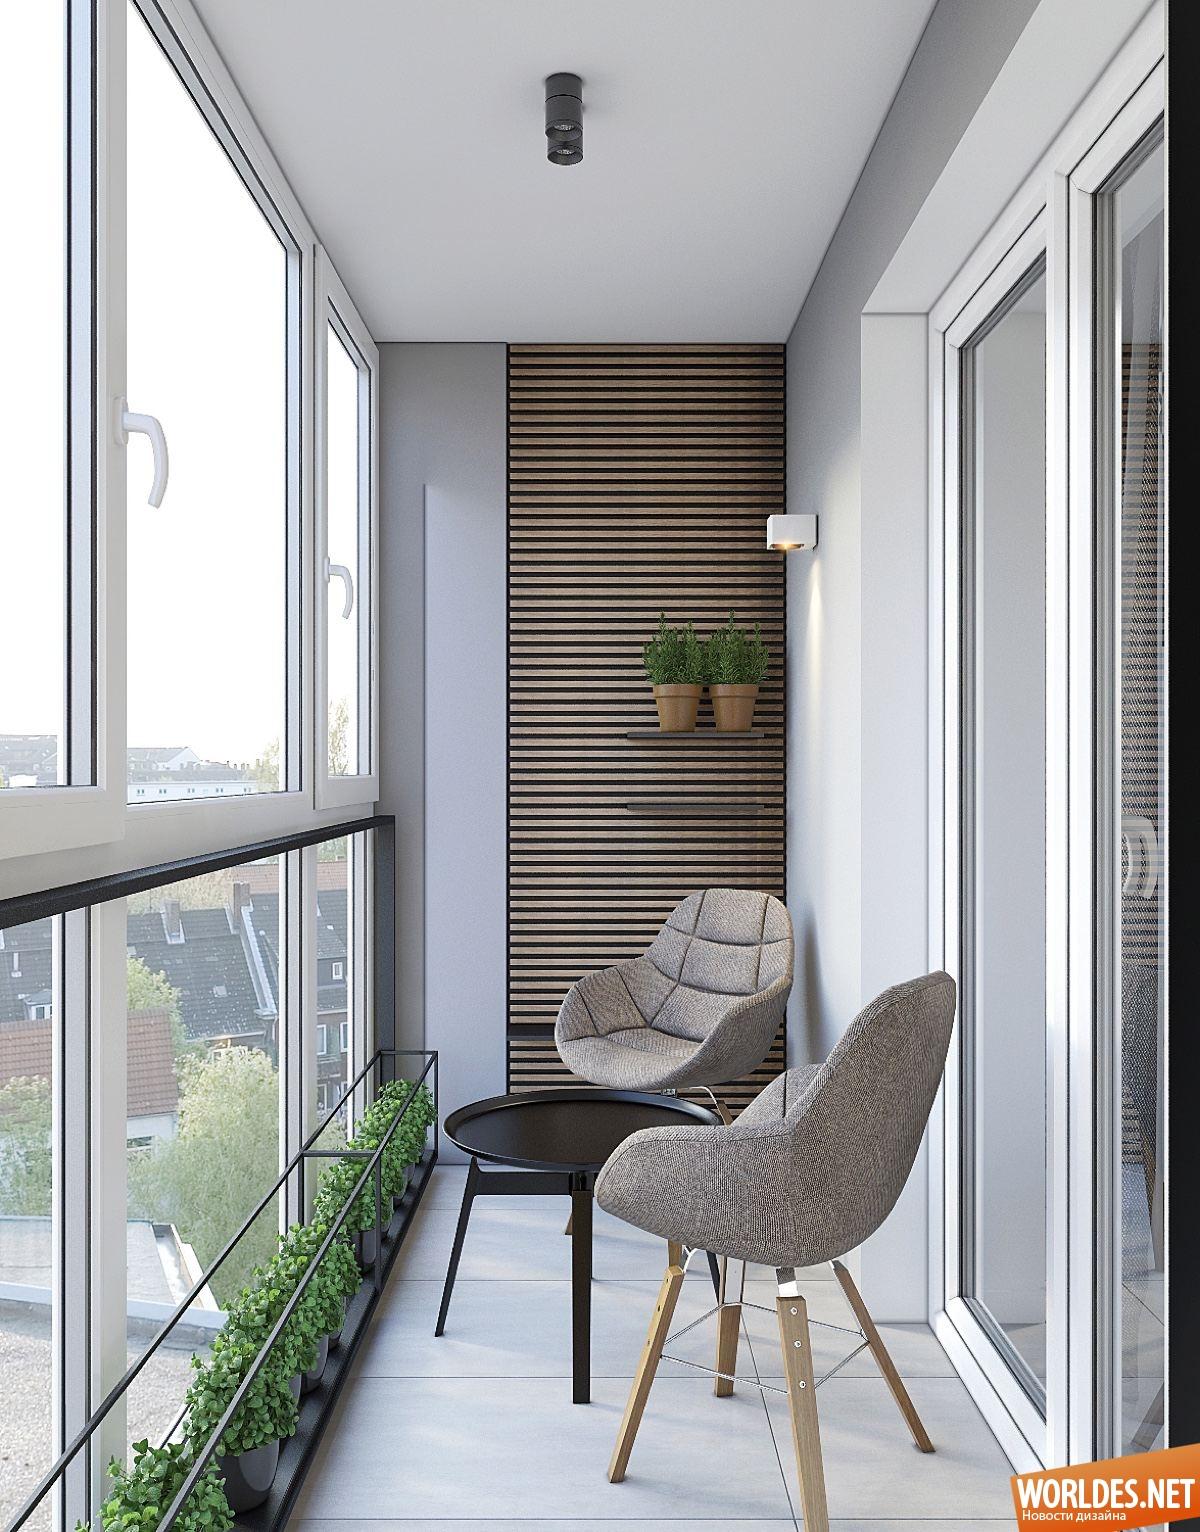 Beautiful interior design balcony ideas contemporary - inter.